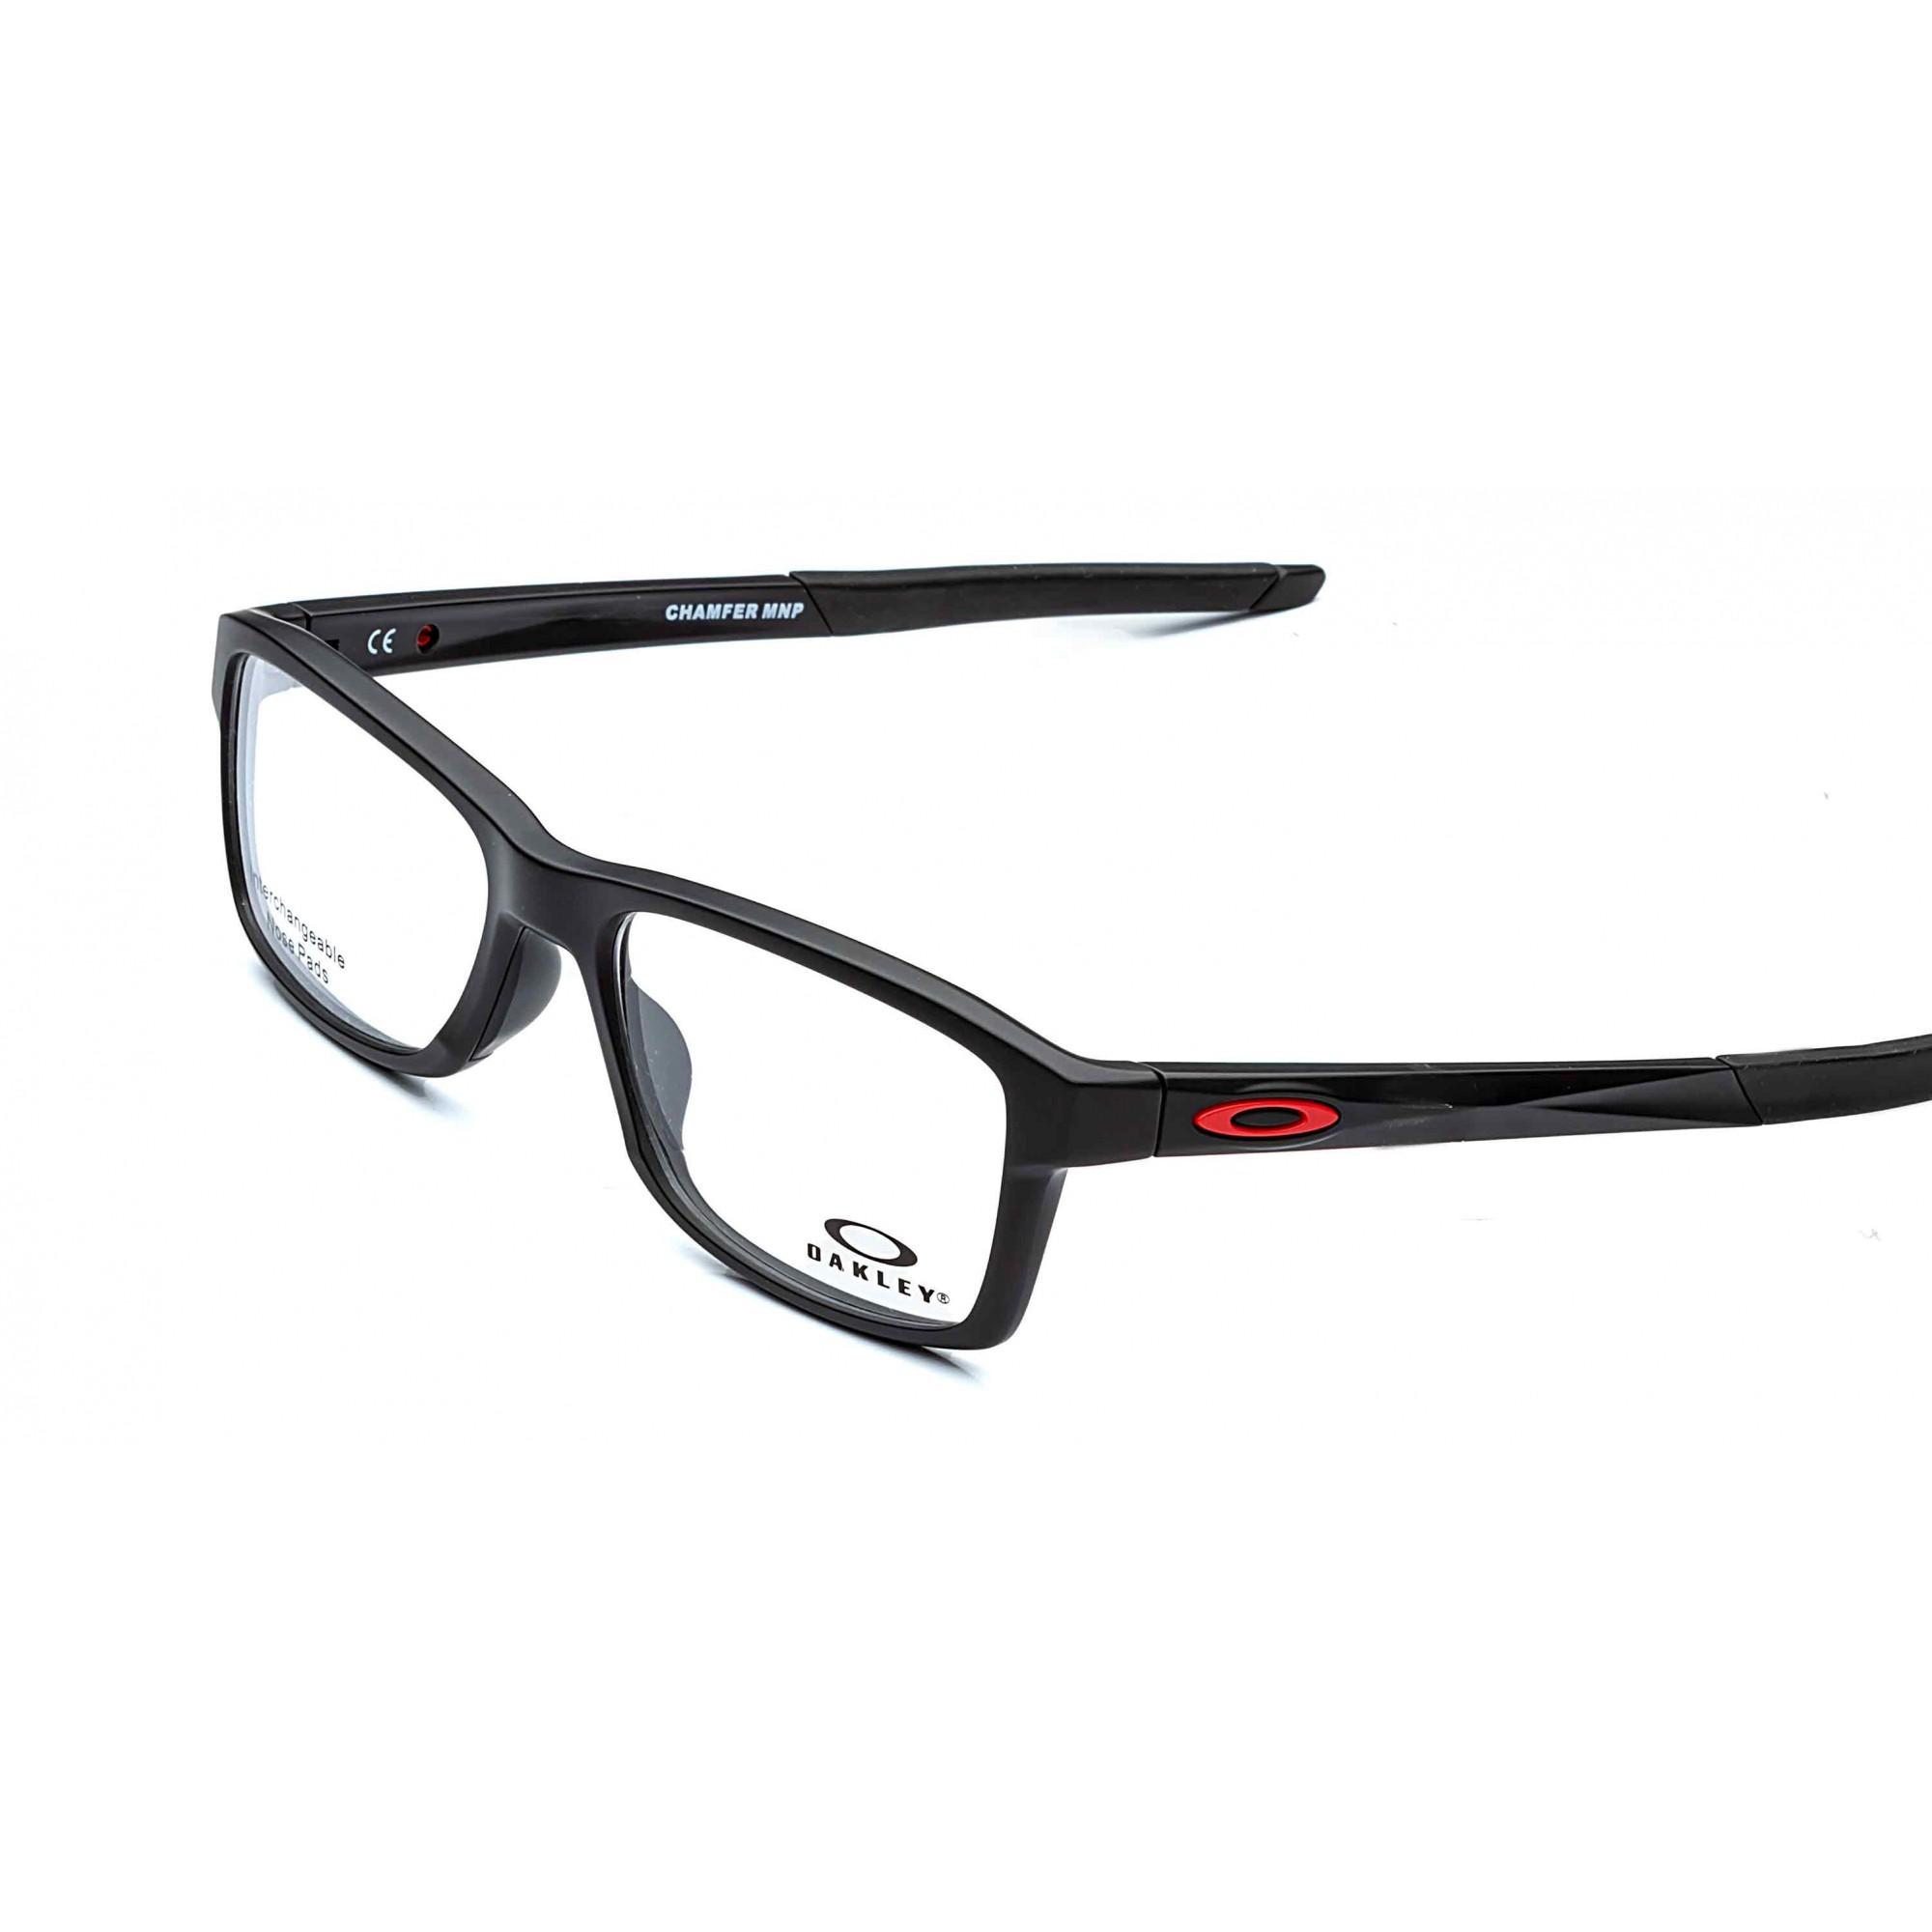 Óculos de Grau Chamfer Mnp Oakley